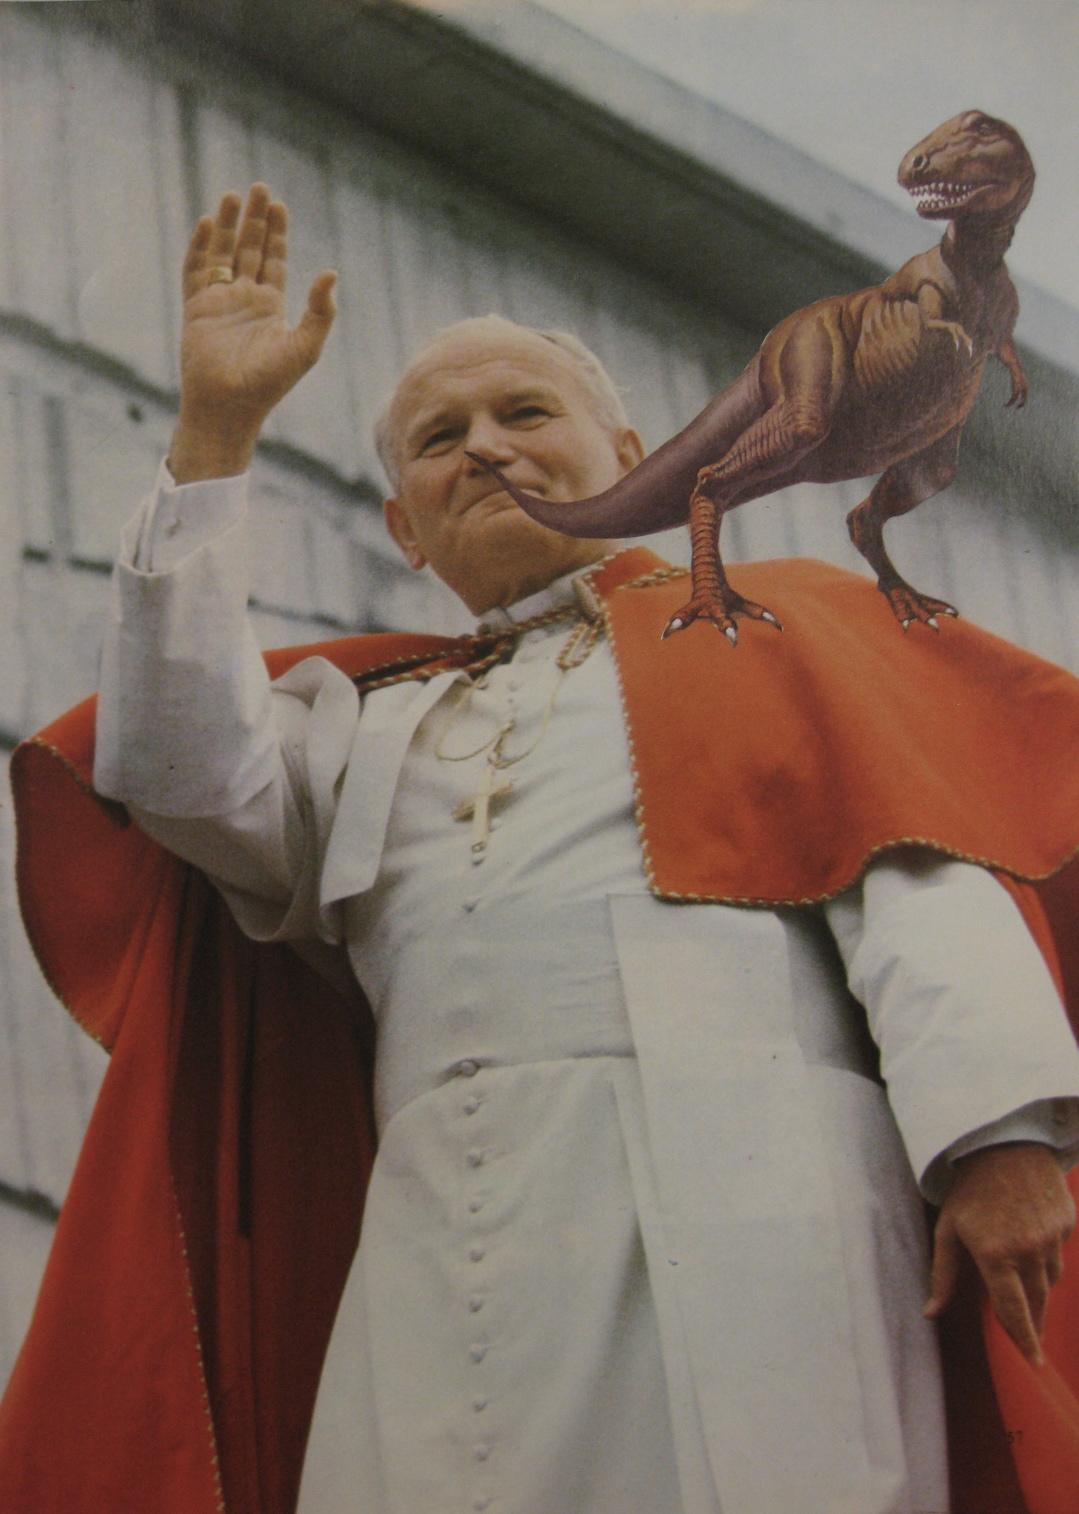 Pope meets Dino 9.JPG